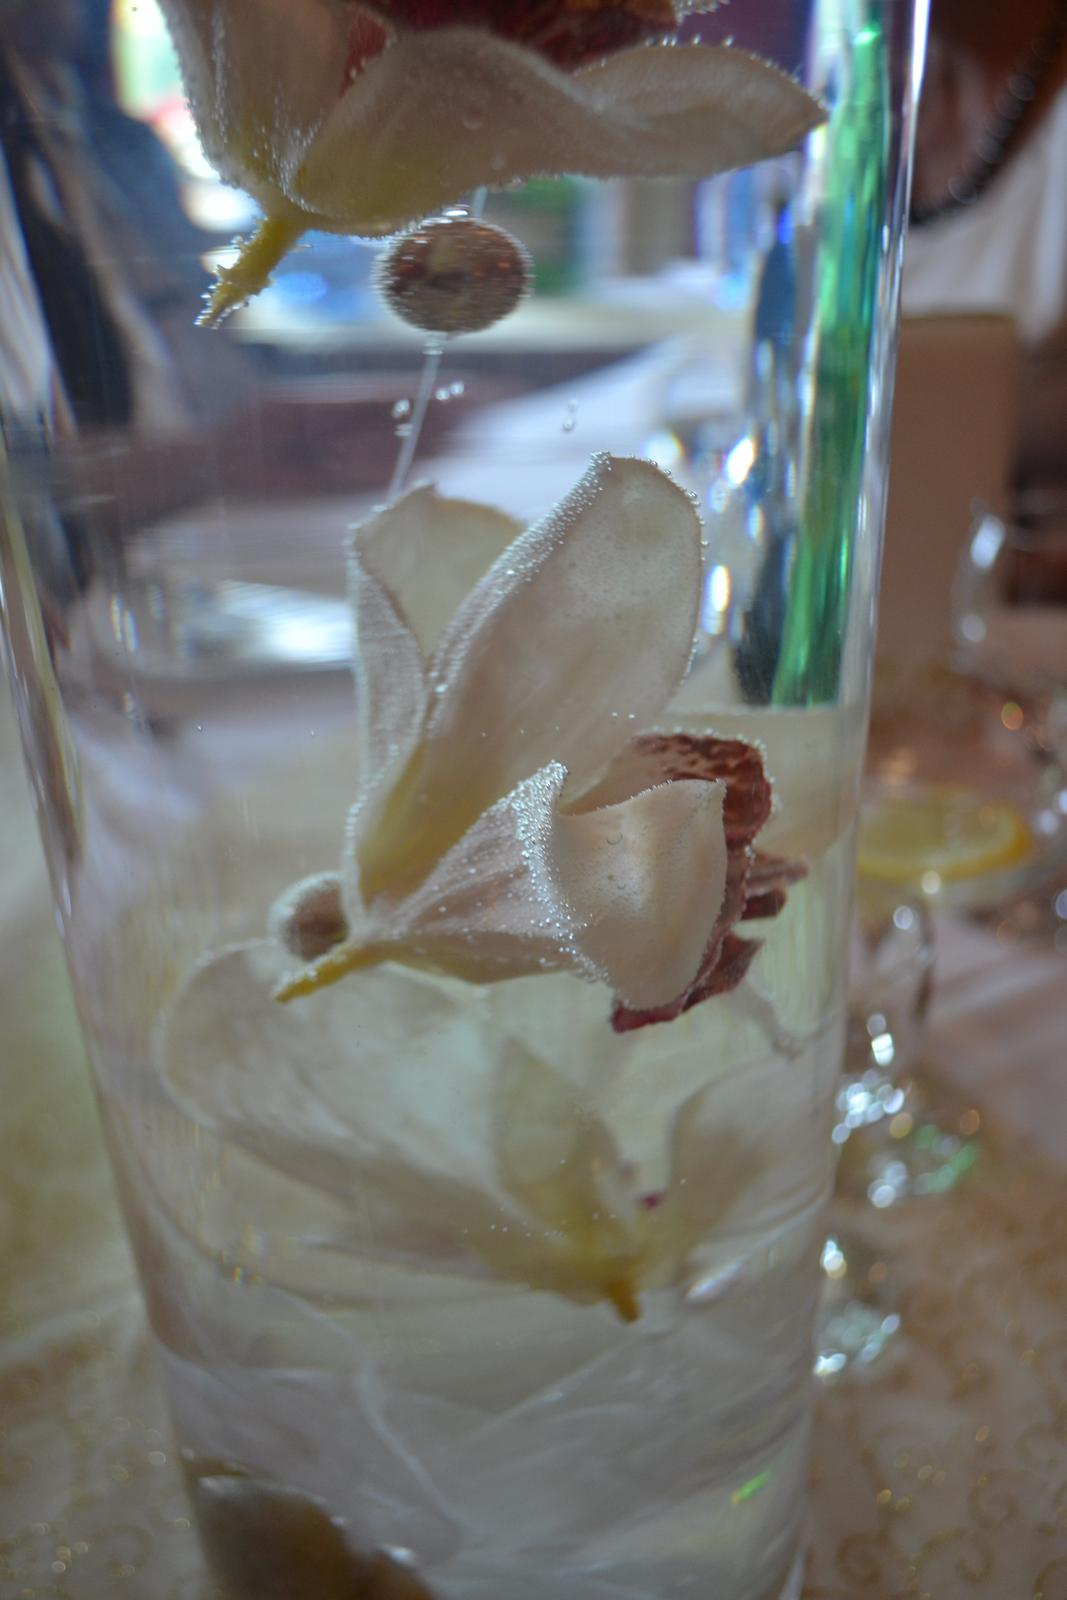 @soro88 nase orchidee boli... - Obrázok č. 1